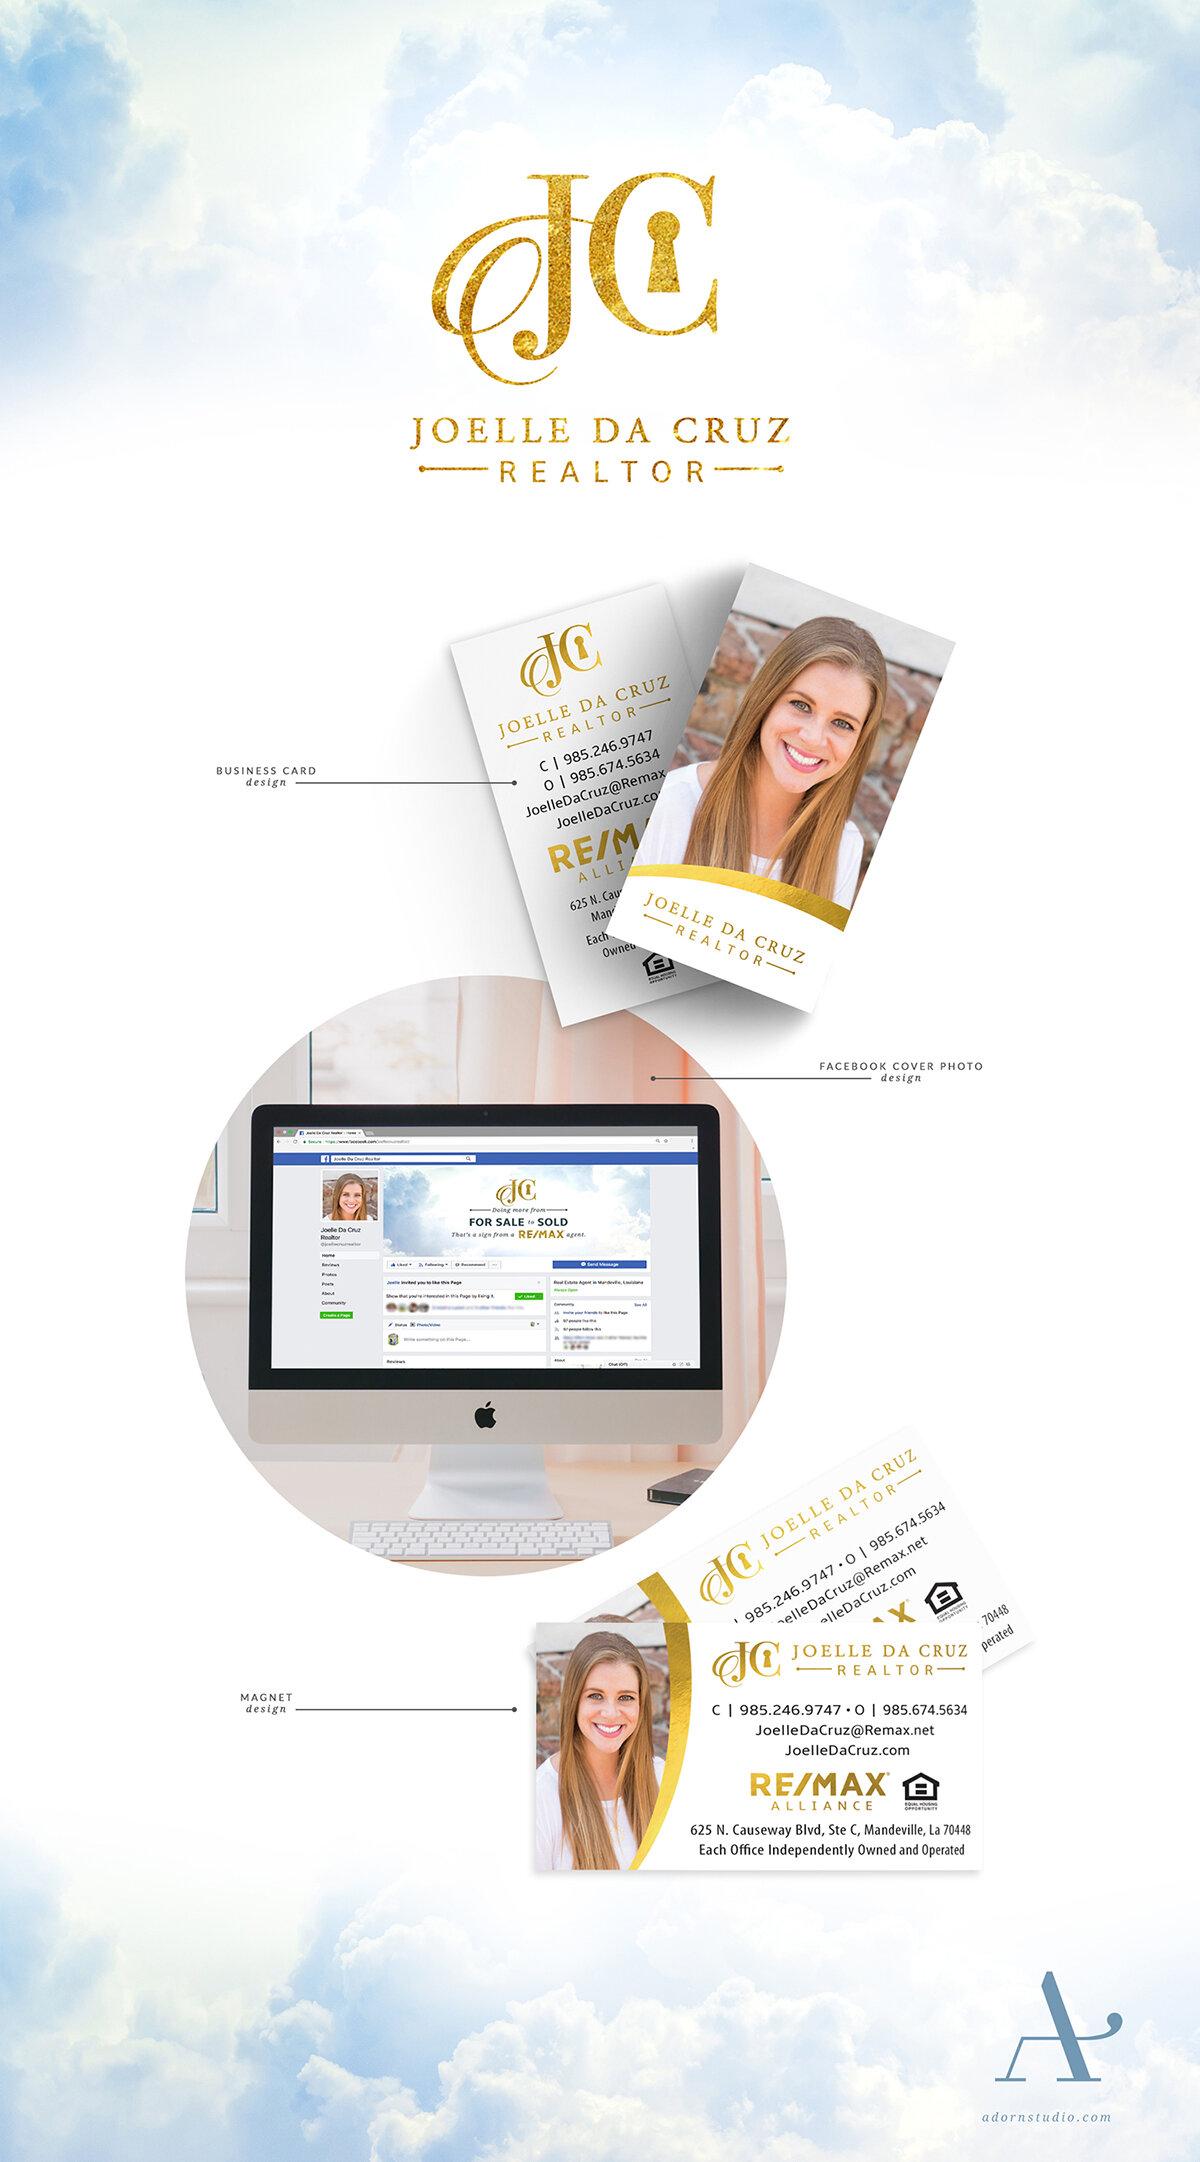 Adorn Studio   Innovative and Minimalist Graphic Design   Joelle da Cruz Branding   Remax Alliance Realtor